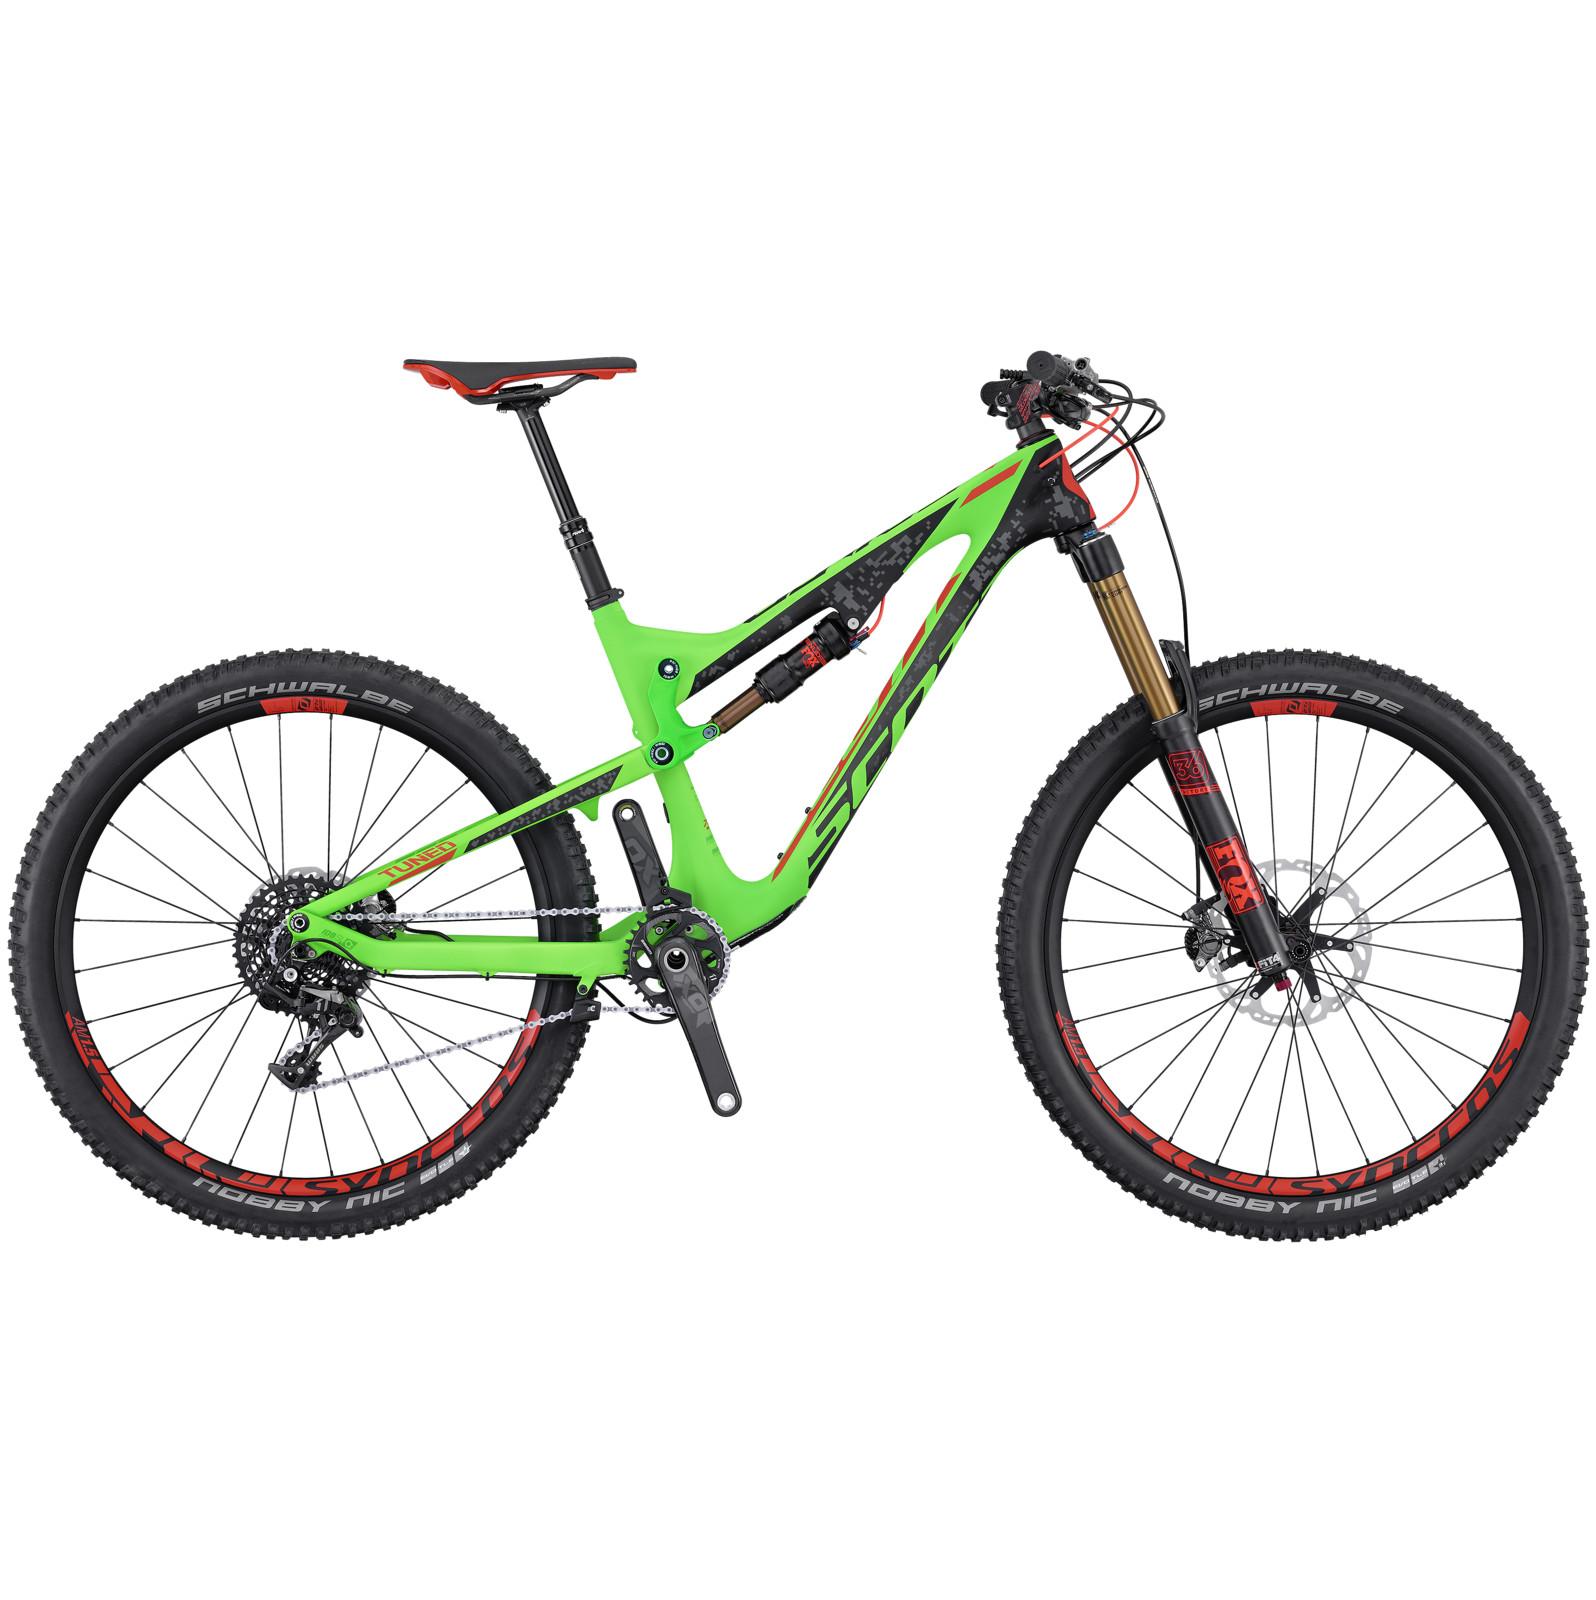 2016 Scott Genius LT 700 Tuned Bike - Reviews, Comparisons